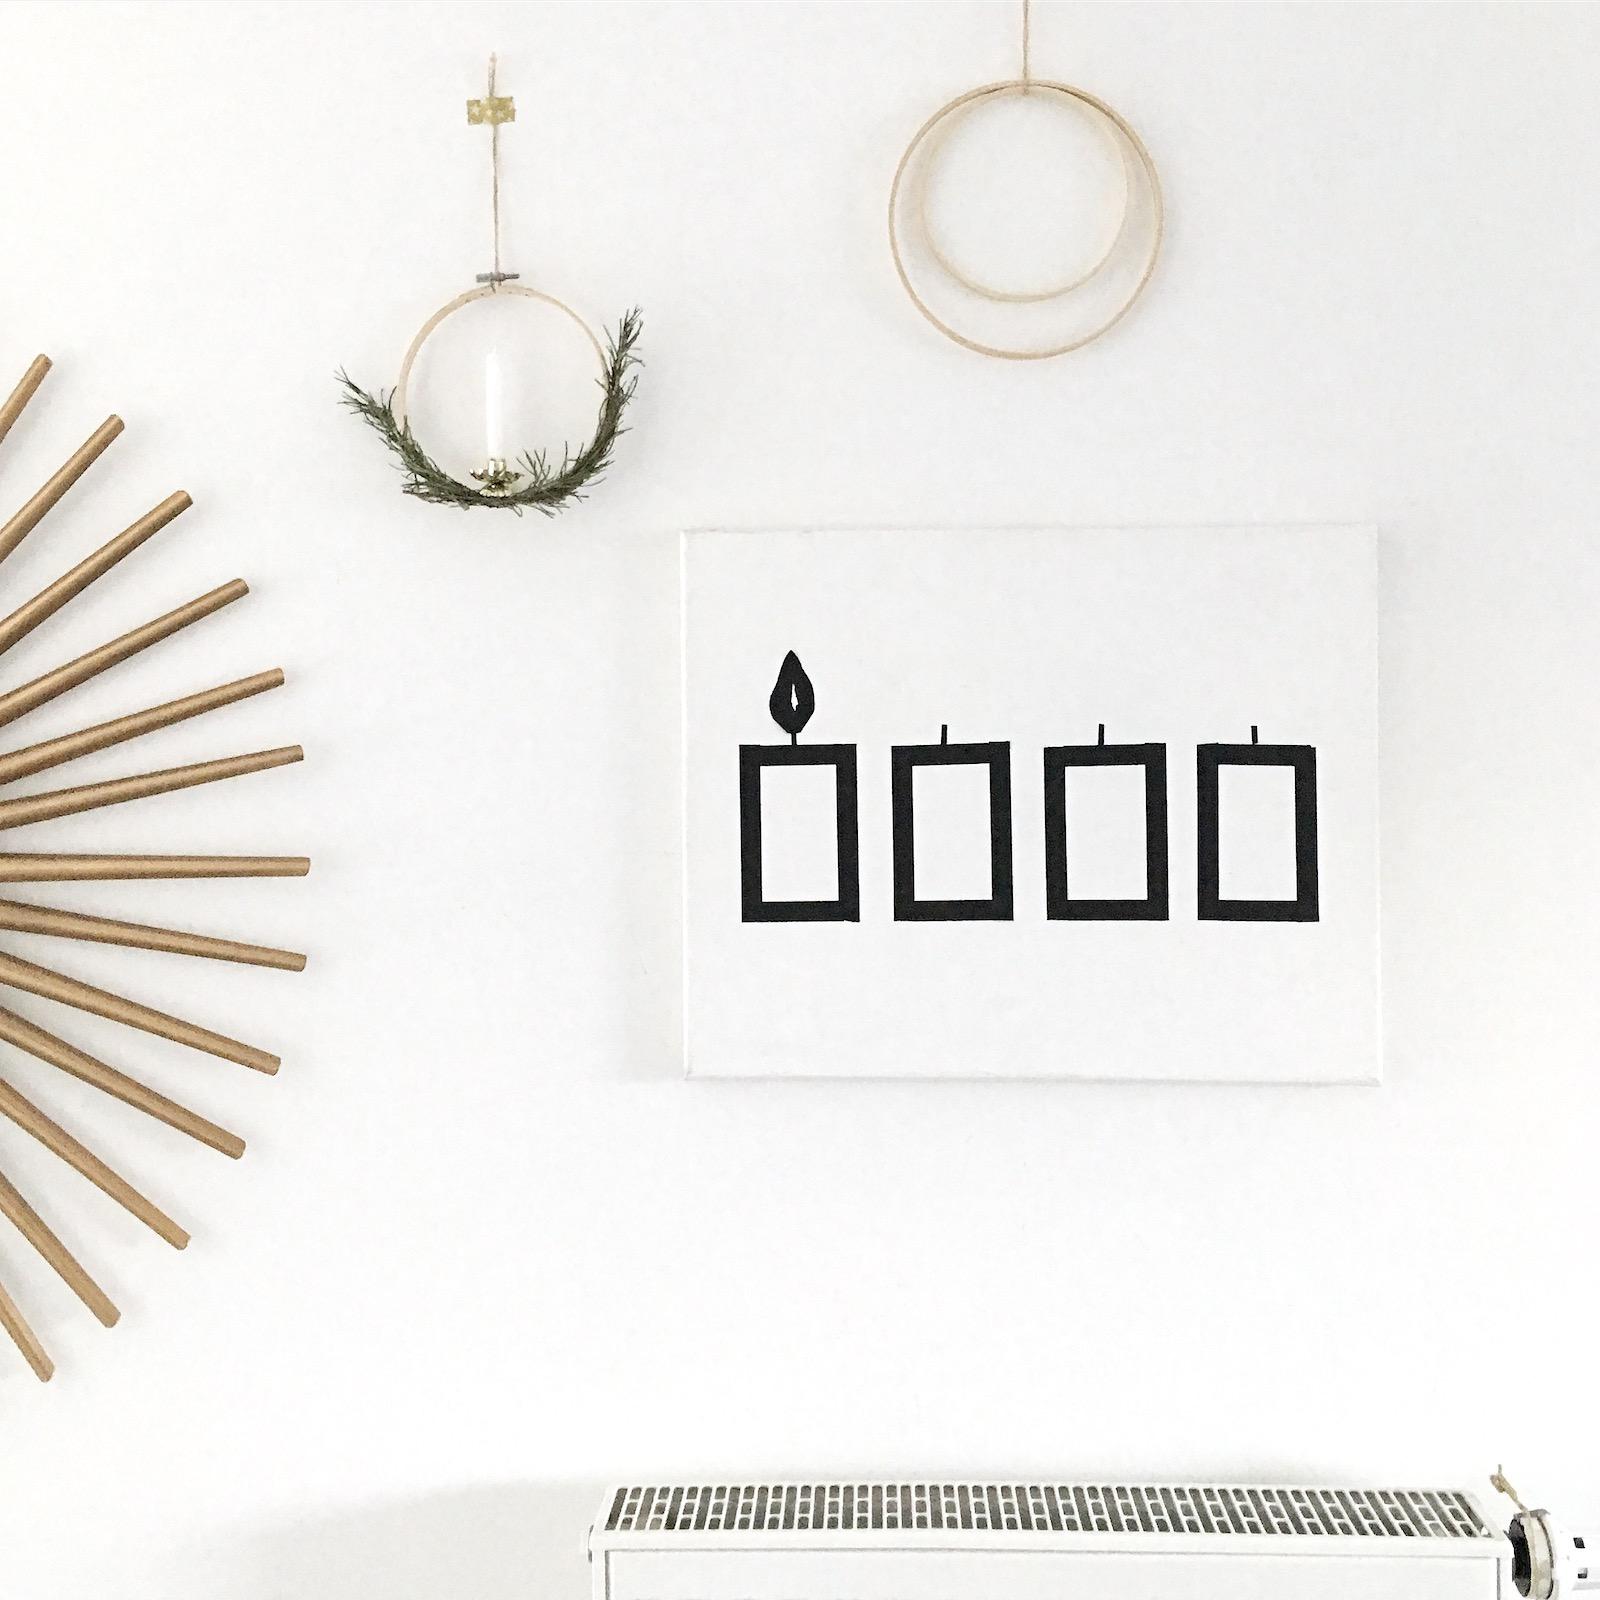 diy masking tape wand adventskerzen sophiagaleria sophiagaleria. Black Bedroom Furniture Sets. Home Design Ideas